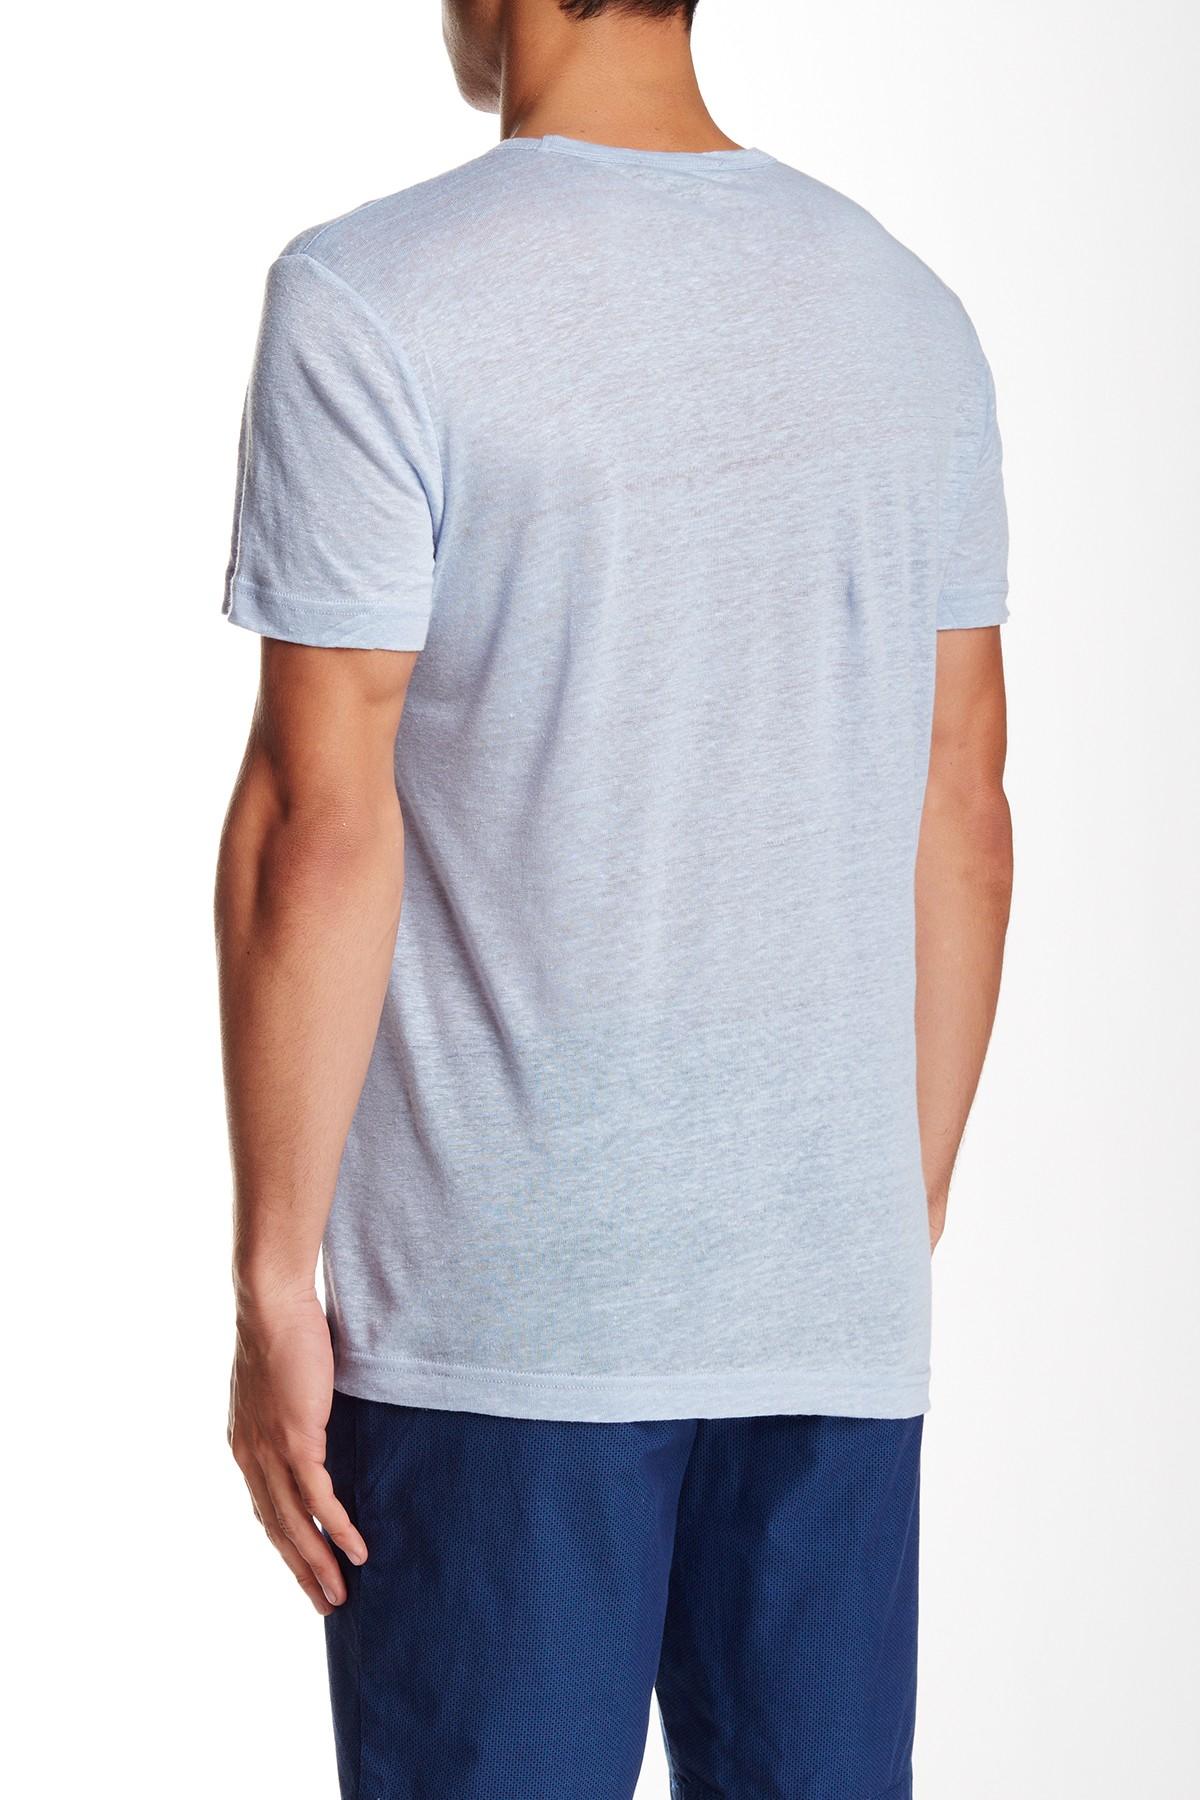 Slate And Stone Clothing : Slate stone short sleeve v neck linen tee in blue for